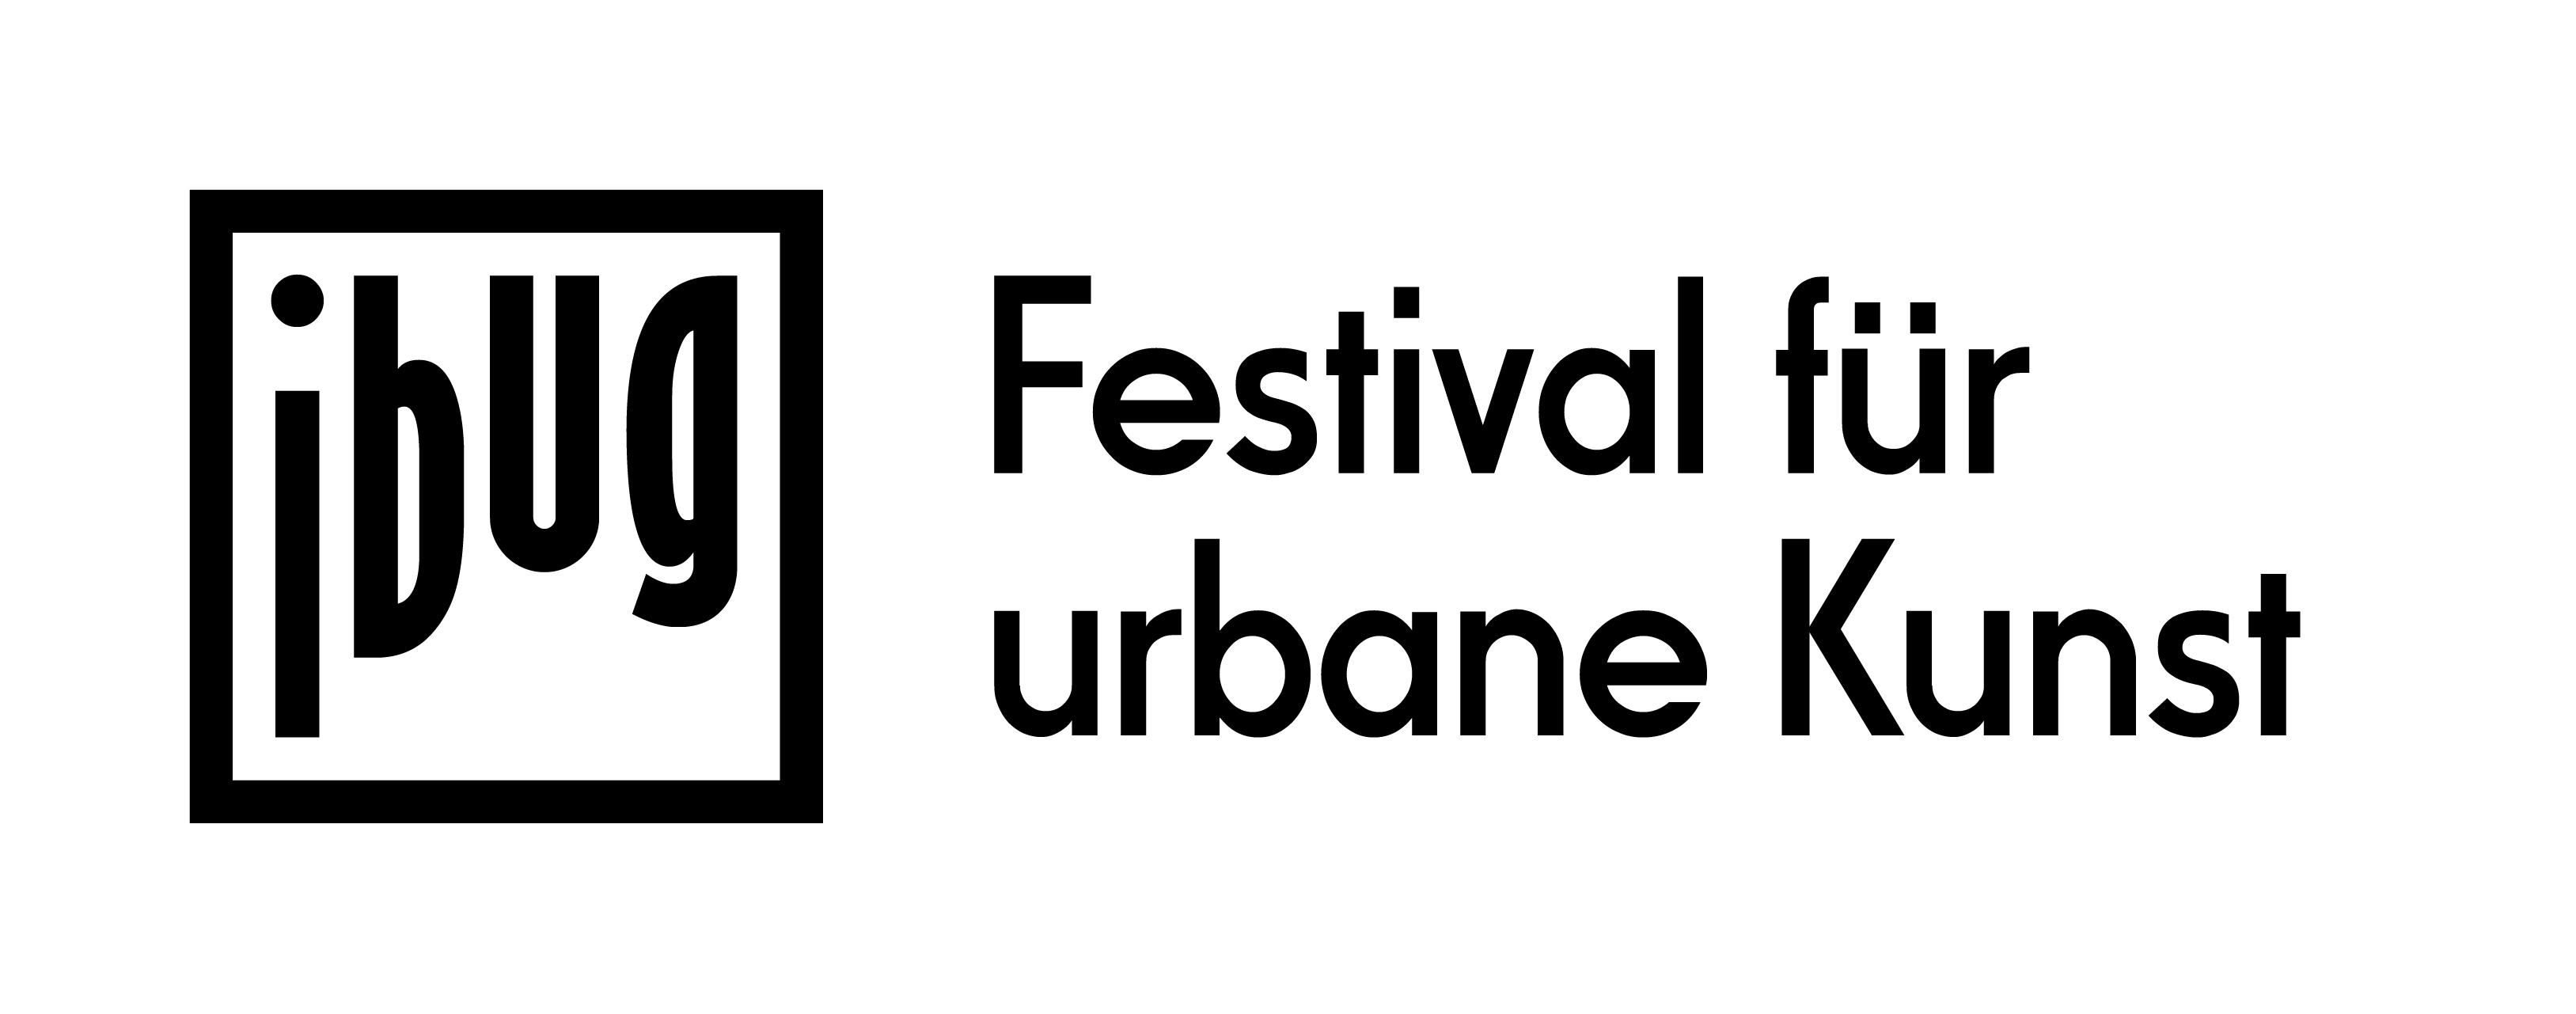 ibug Festival für urbane Kunst